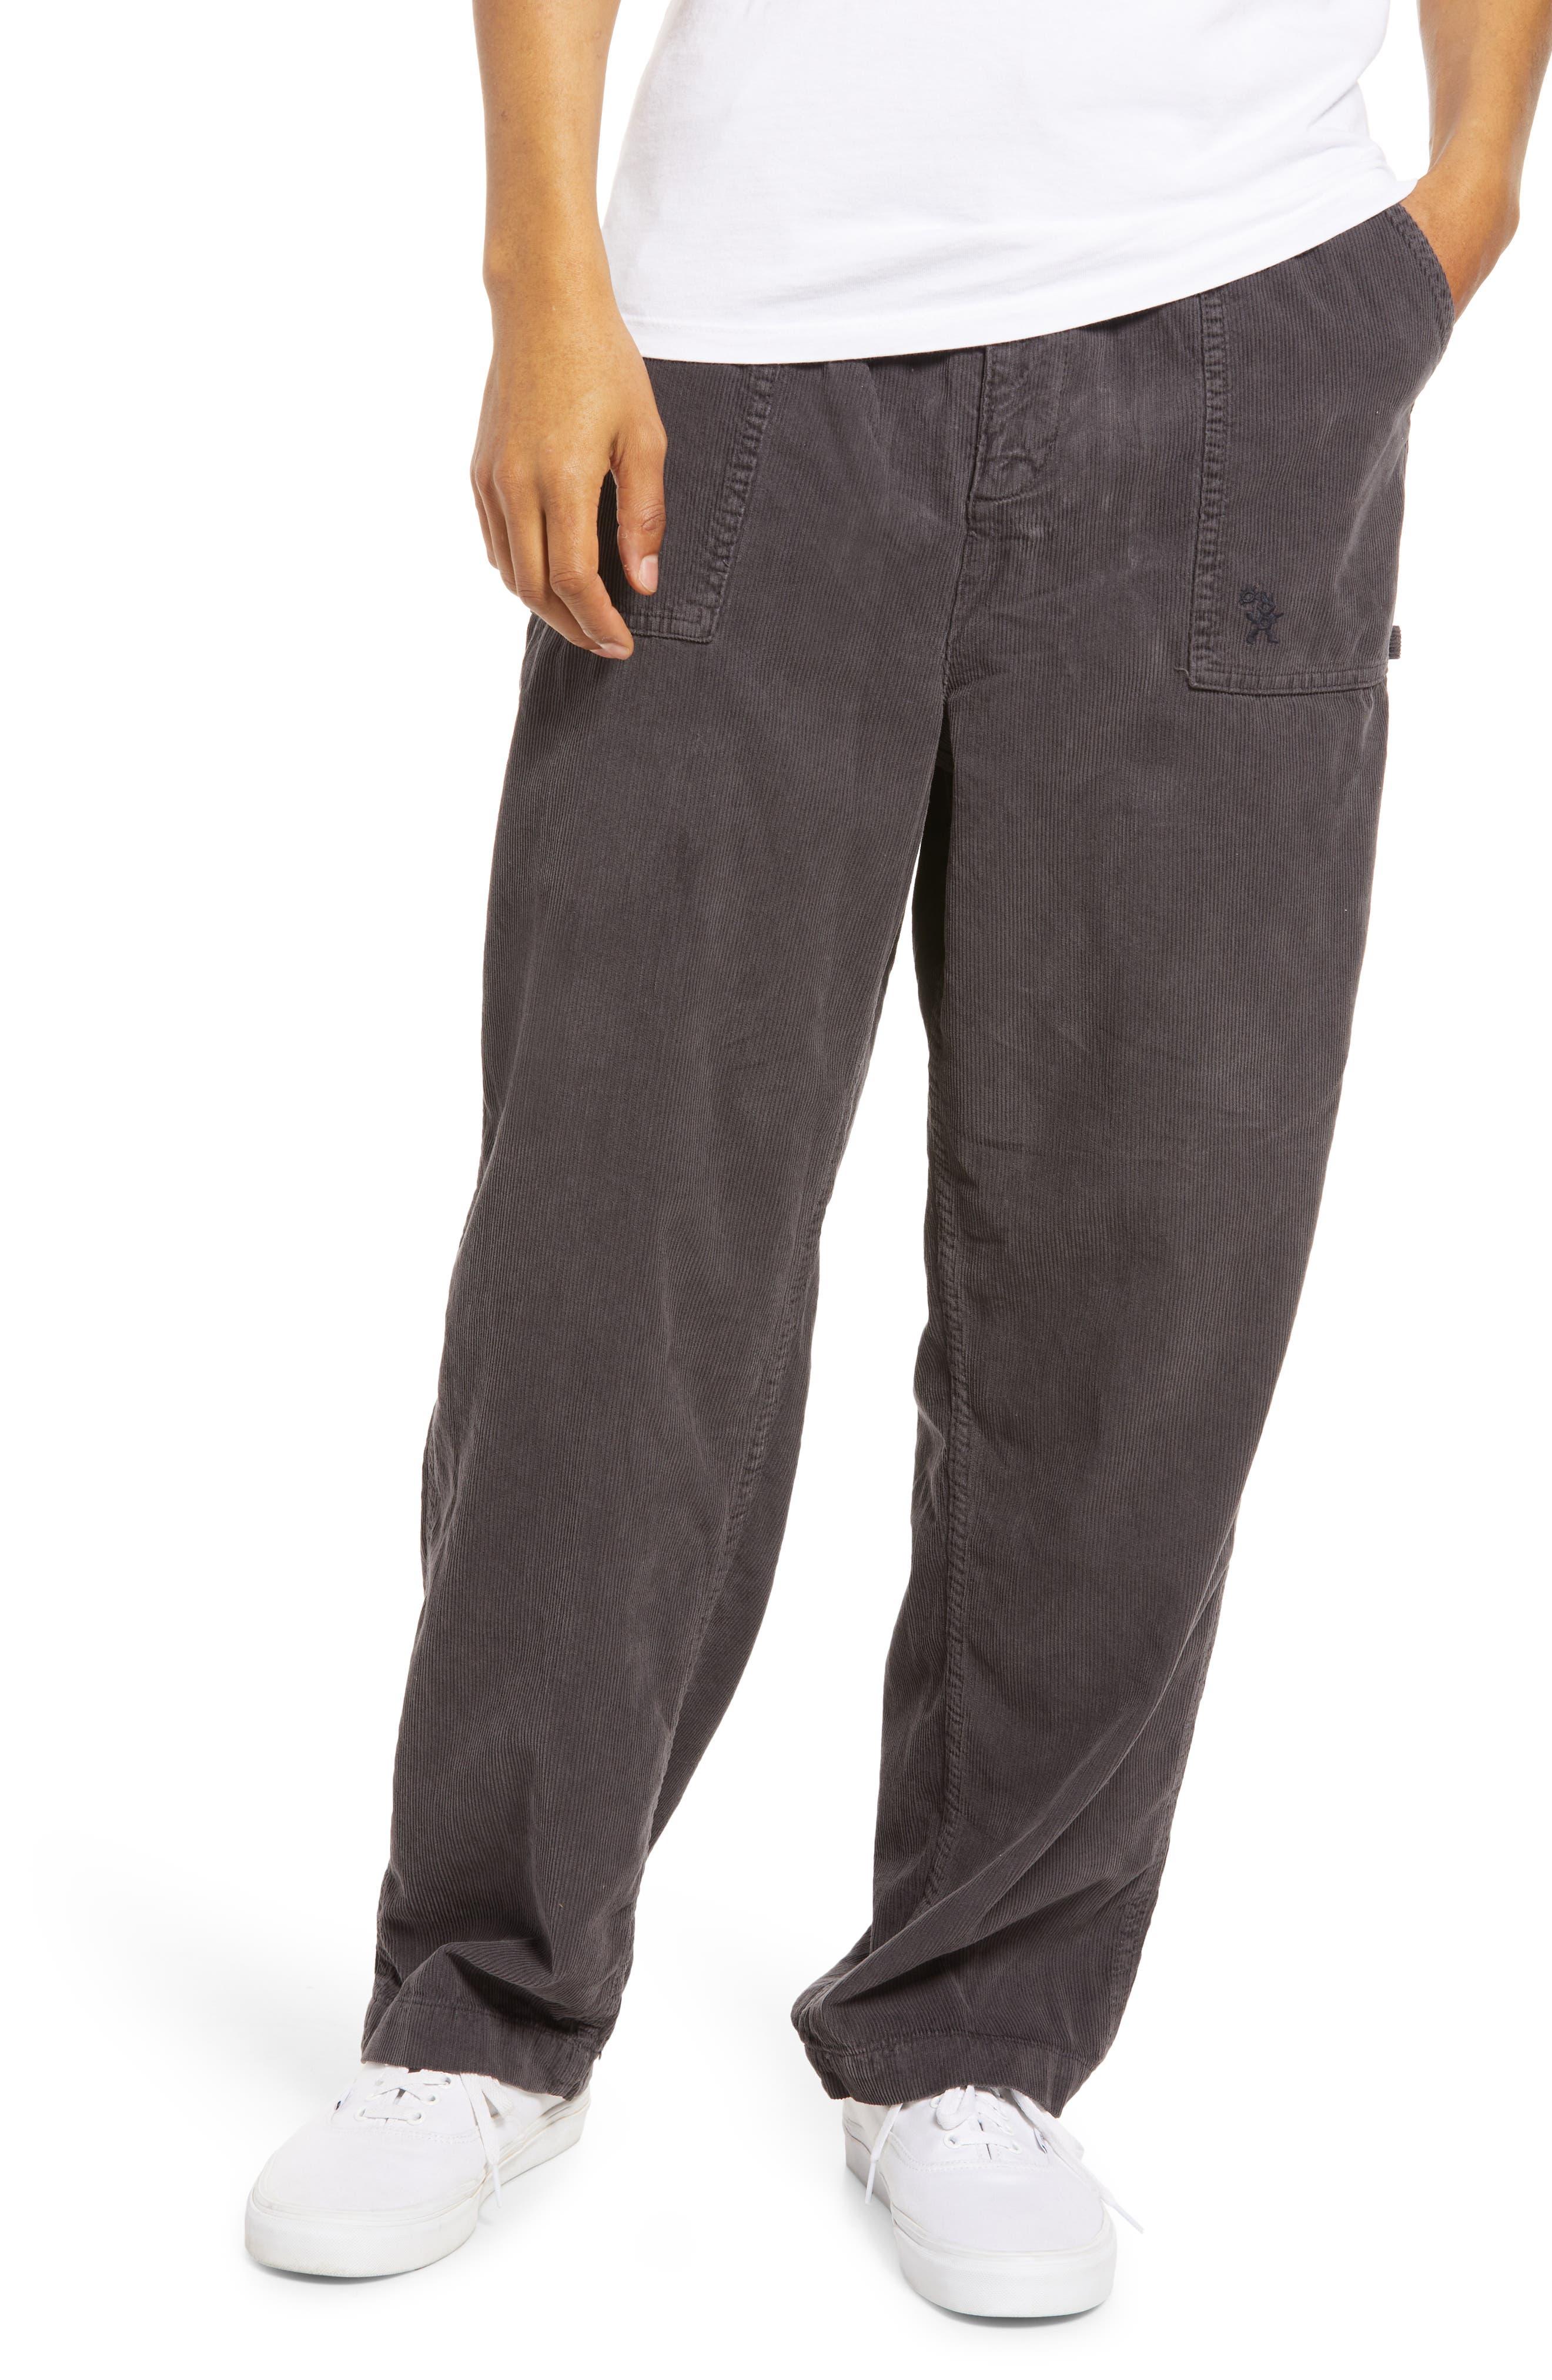 Men's Corduroy Climber Pants